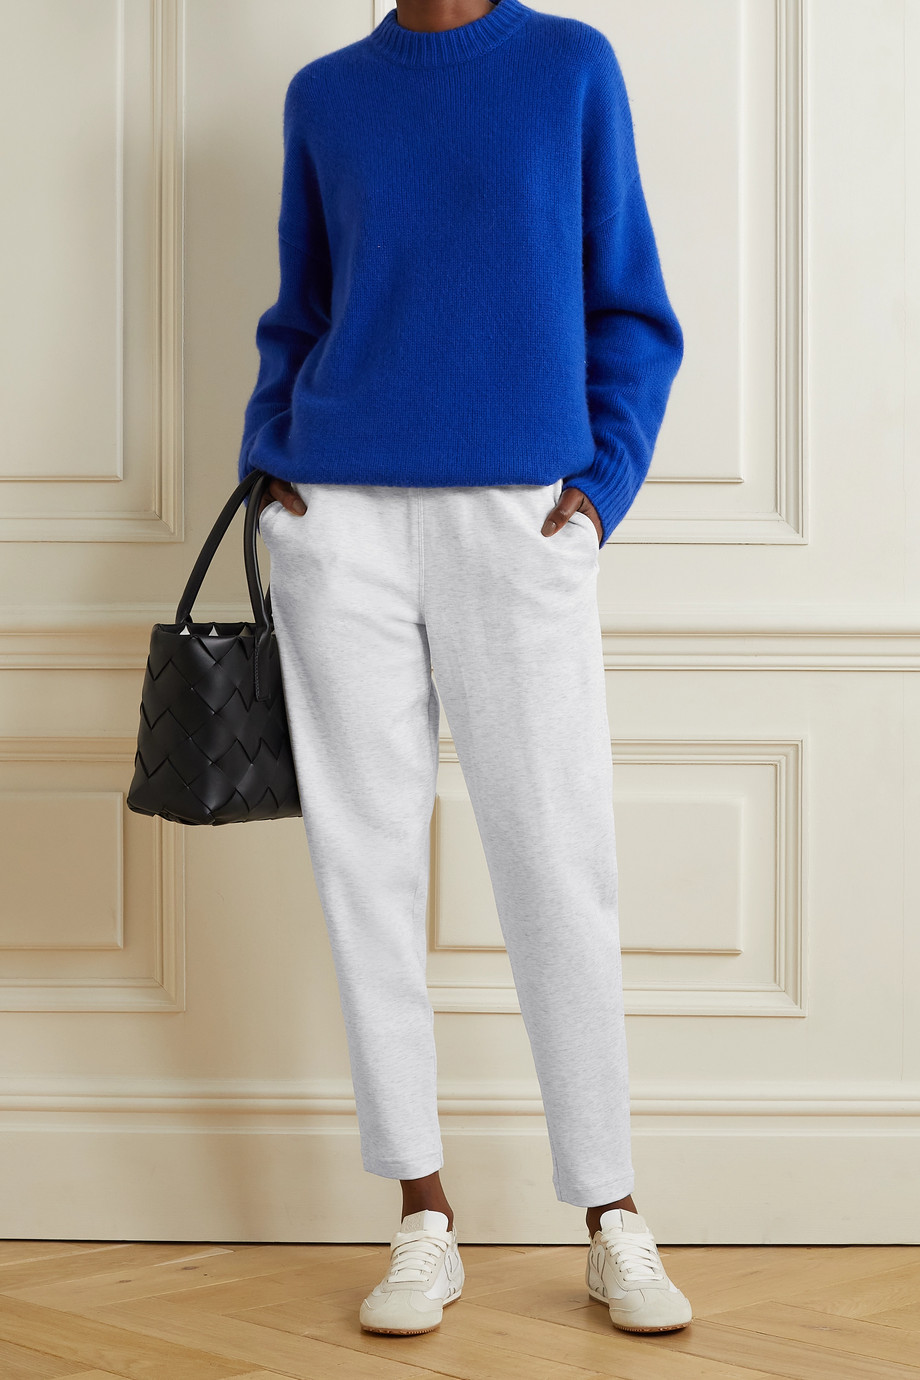 Max Mara + Leisure Pesca cotton-blend jersey track pants